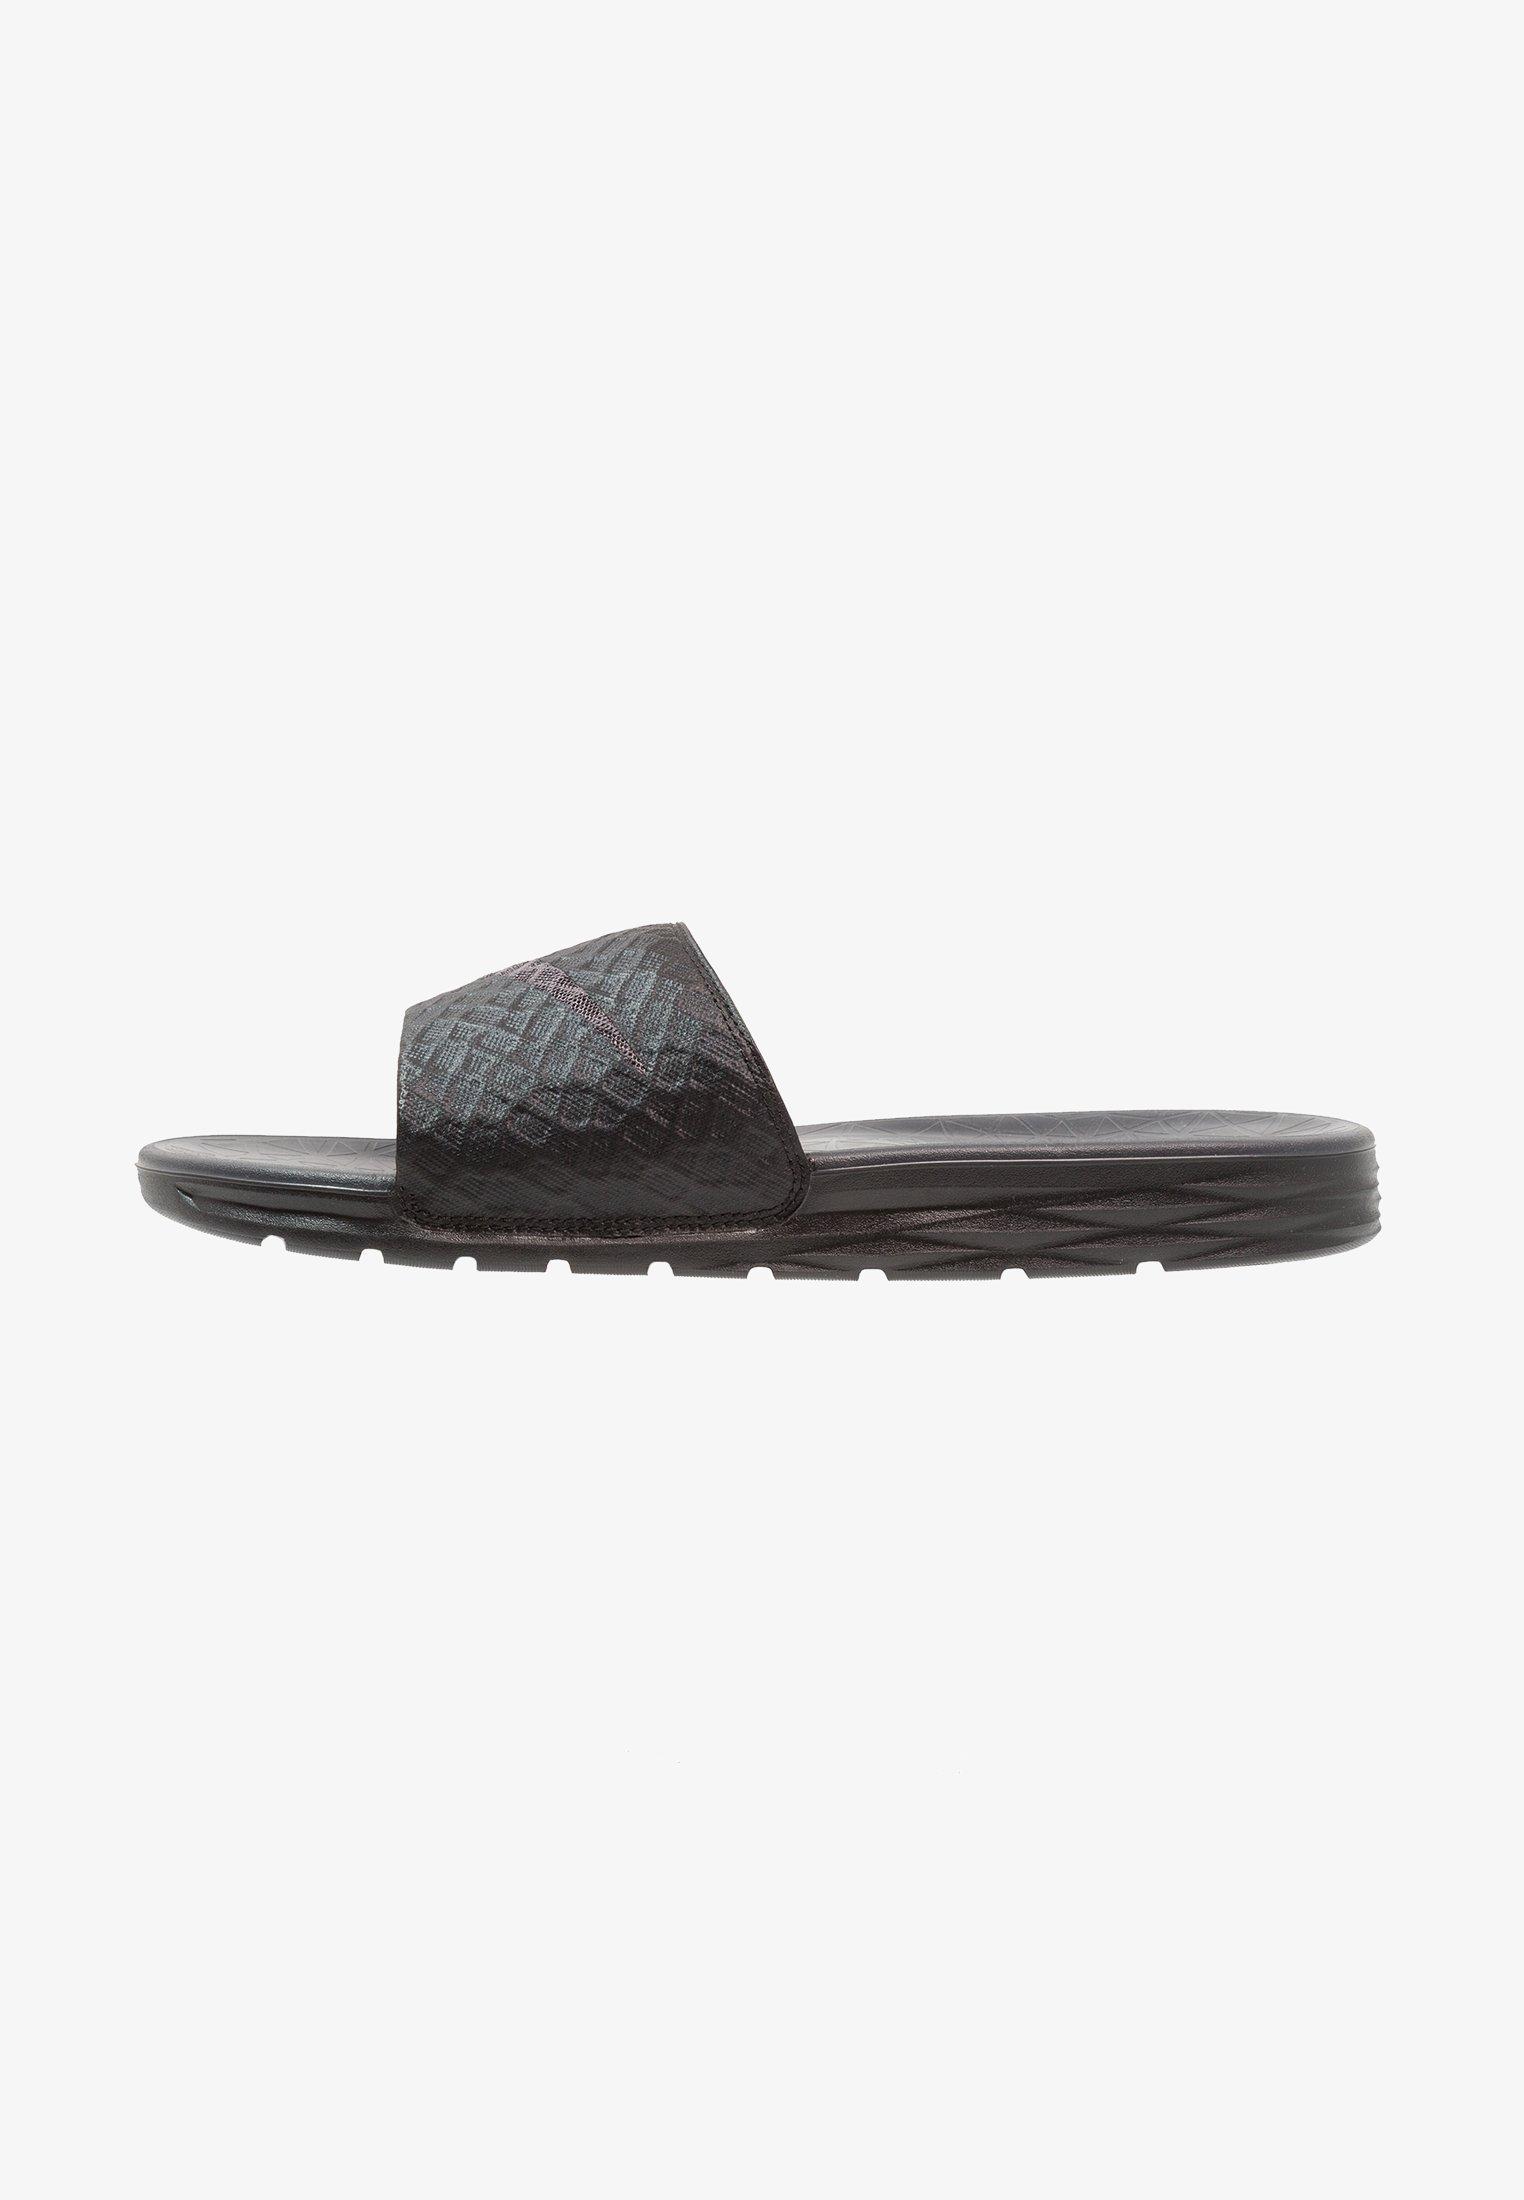 tono Folleto ponerse en cuclillas  Nike Sportswear BENASSI SOLARSOFT - Sandalias planas -  black/anthracite/negro - Zalando.es